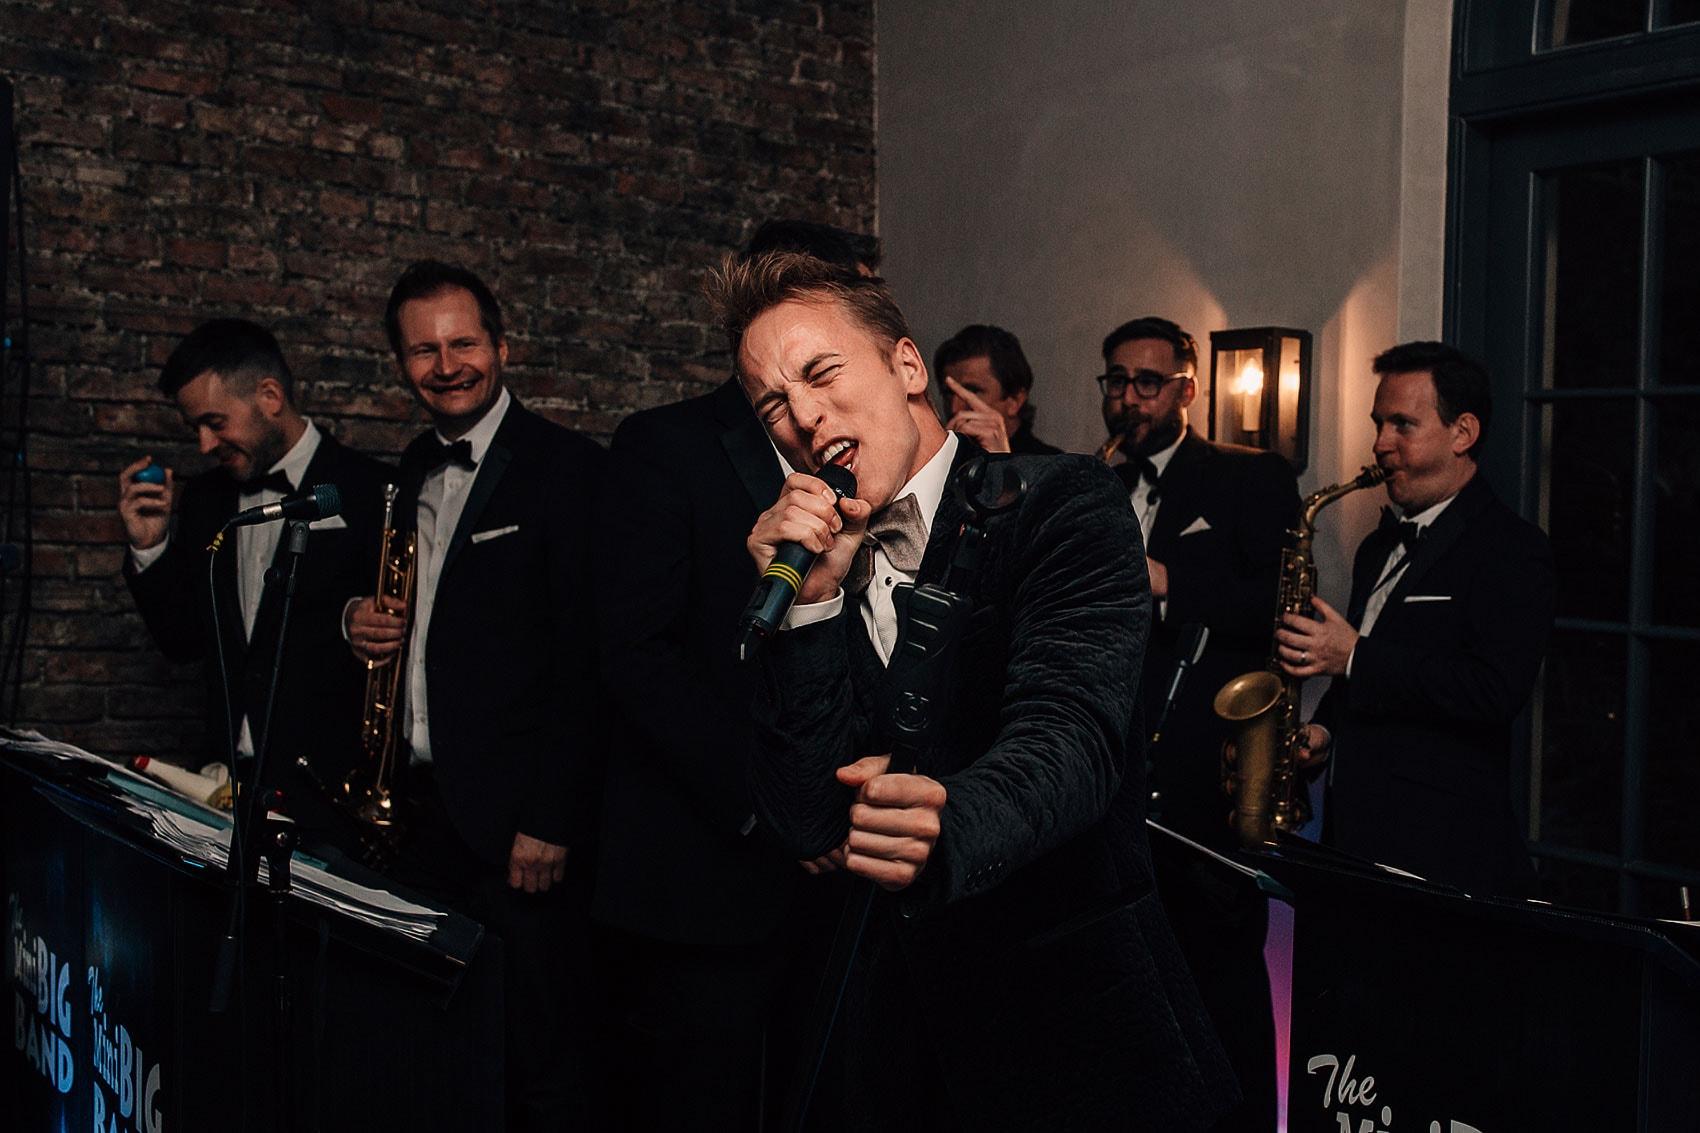 Middleton Lodge Yorkshire wedding dance-floor photography